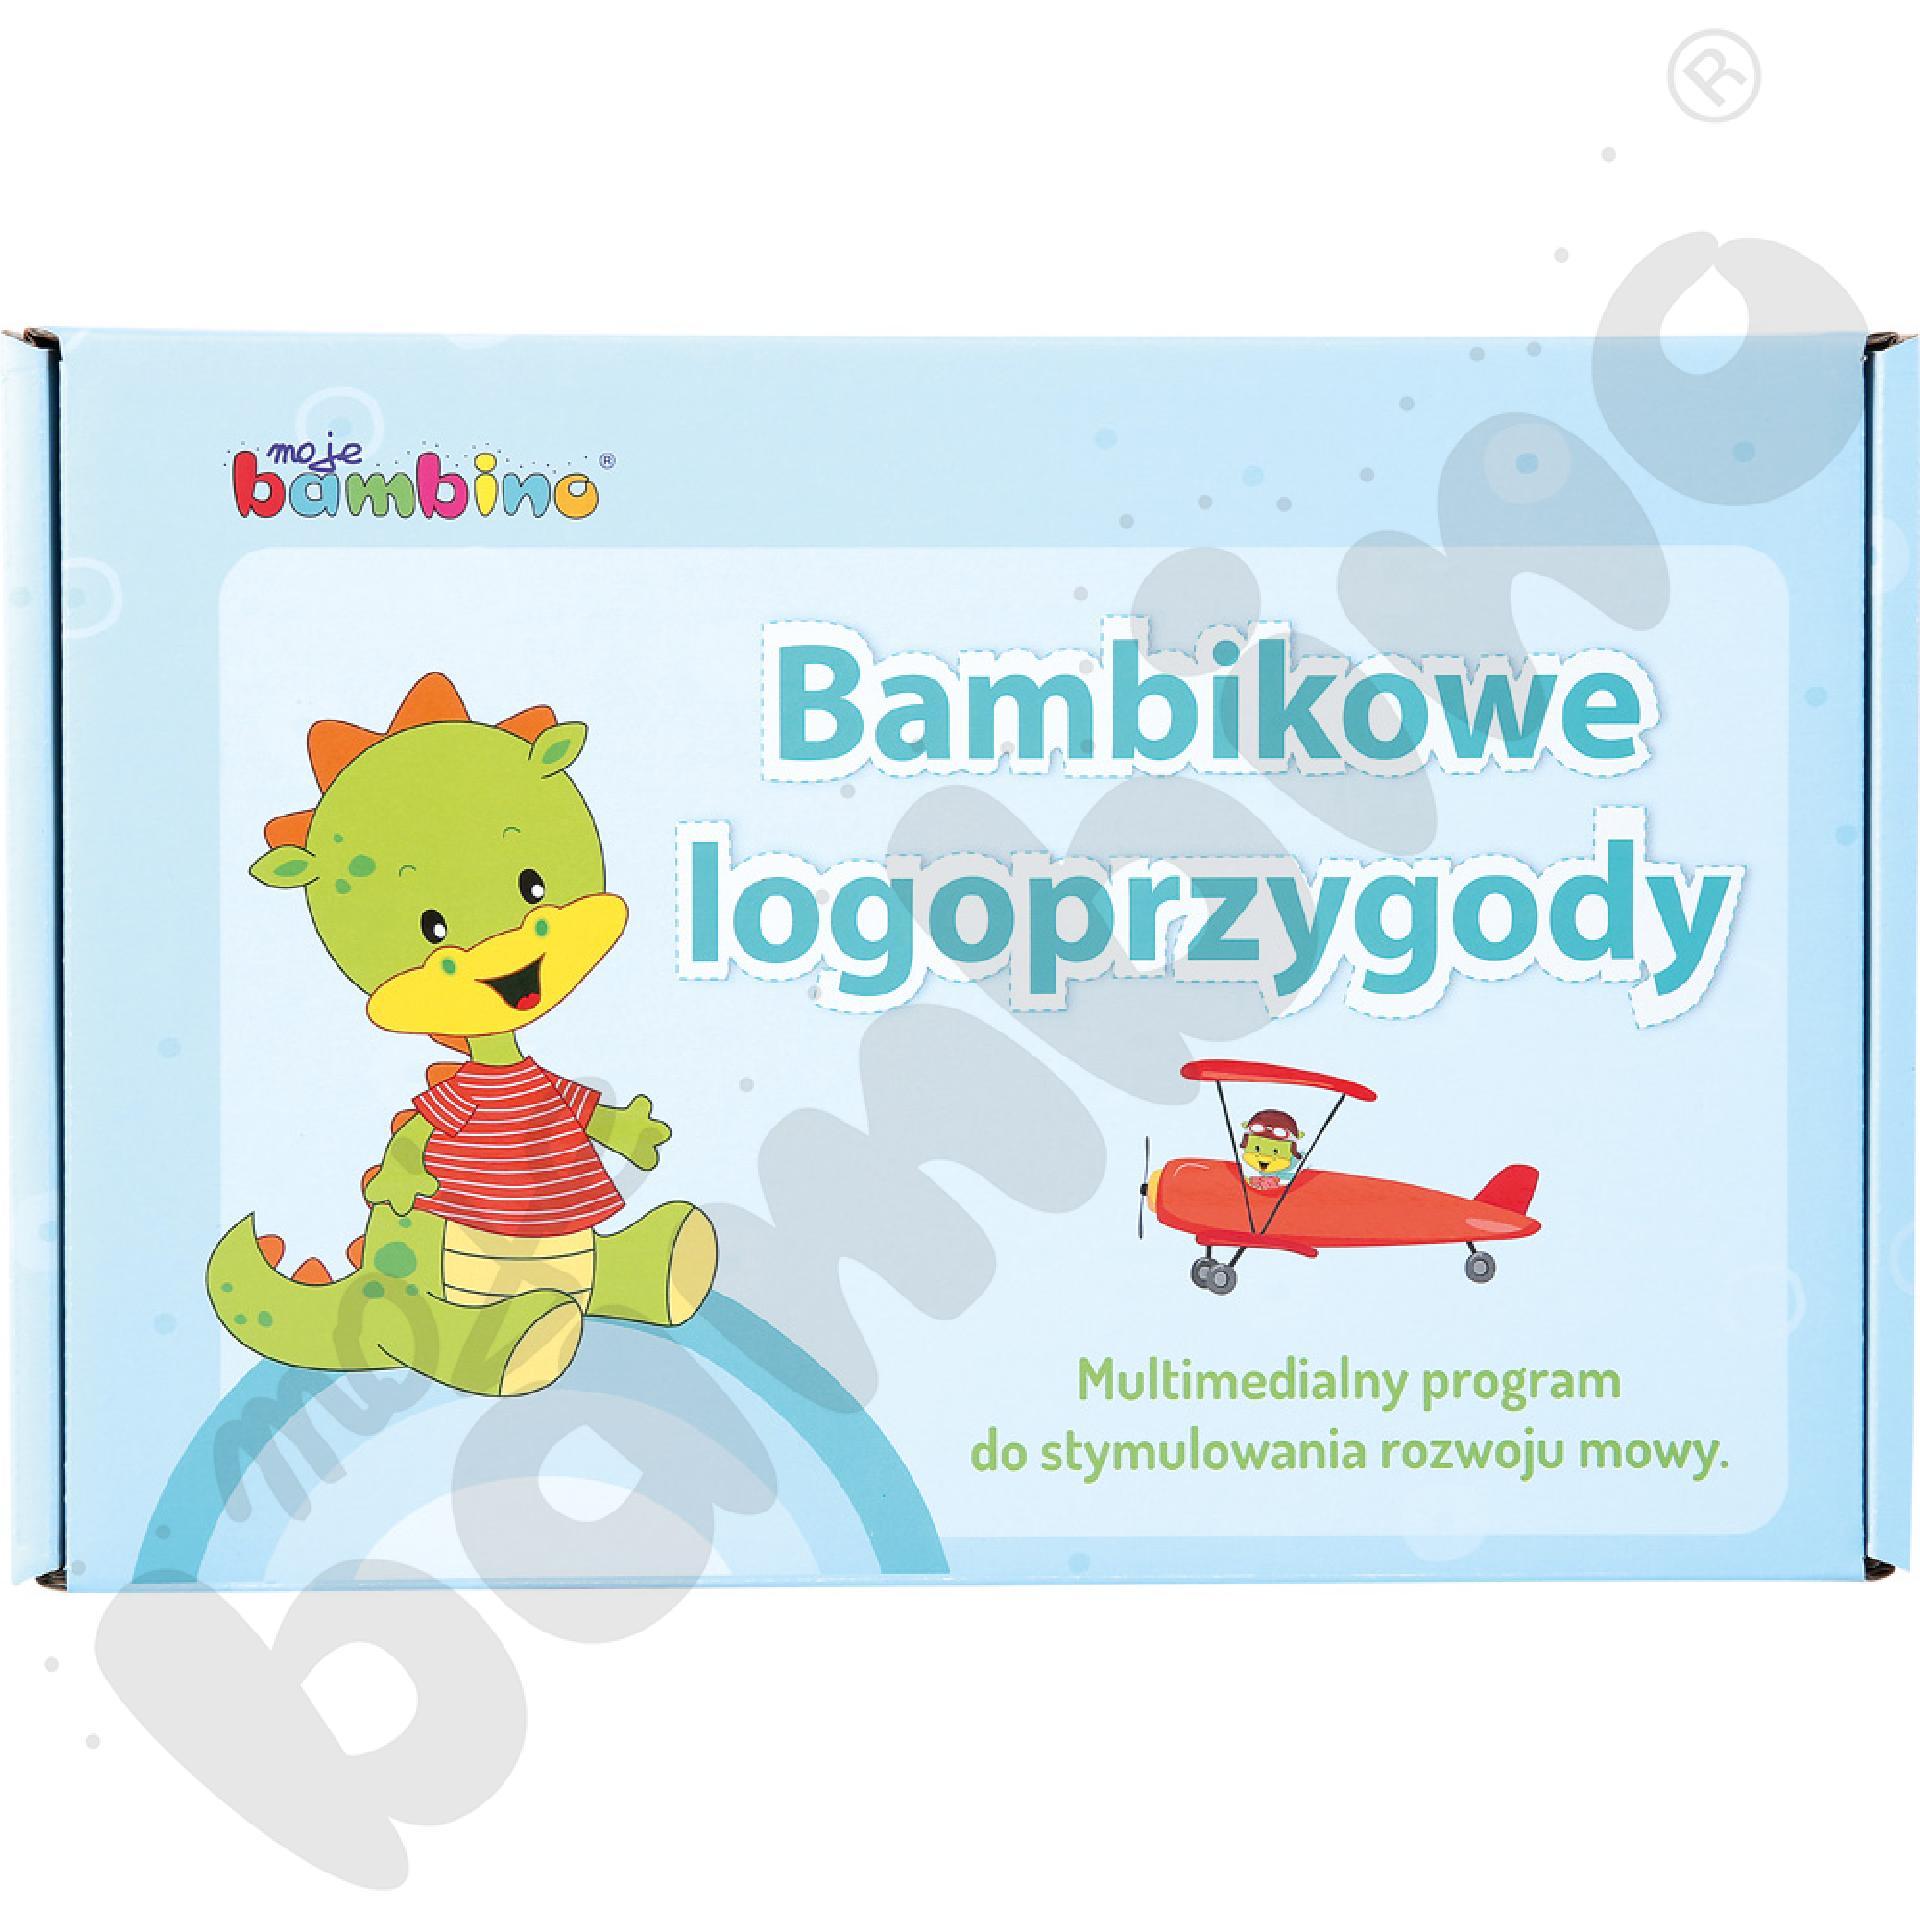 Bambikowe Logoprzygodyaaa